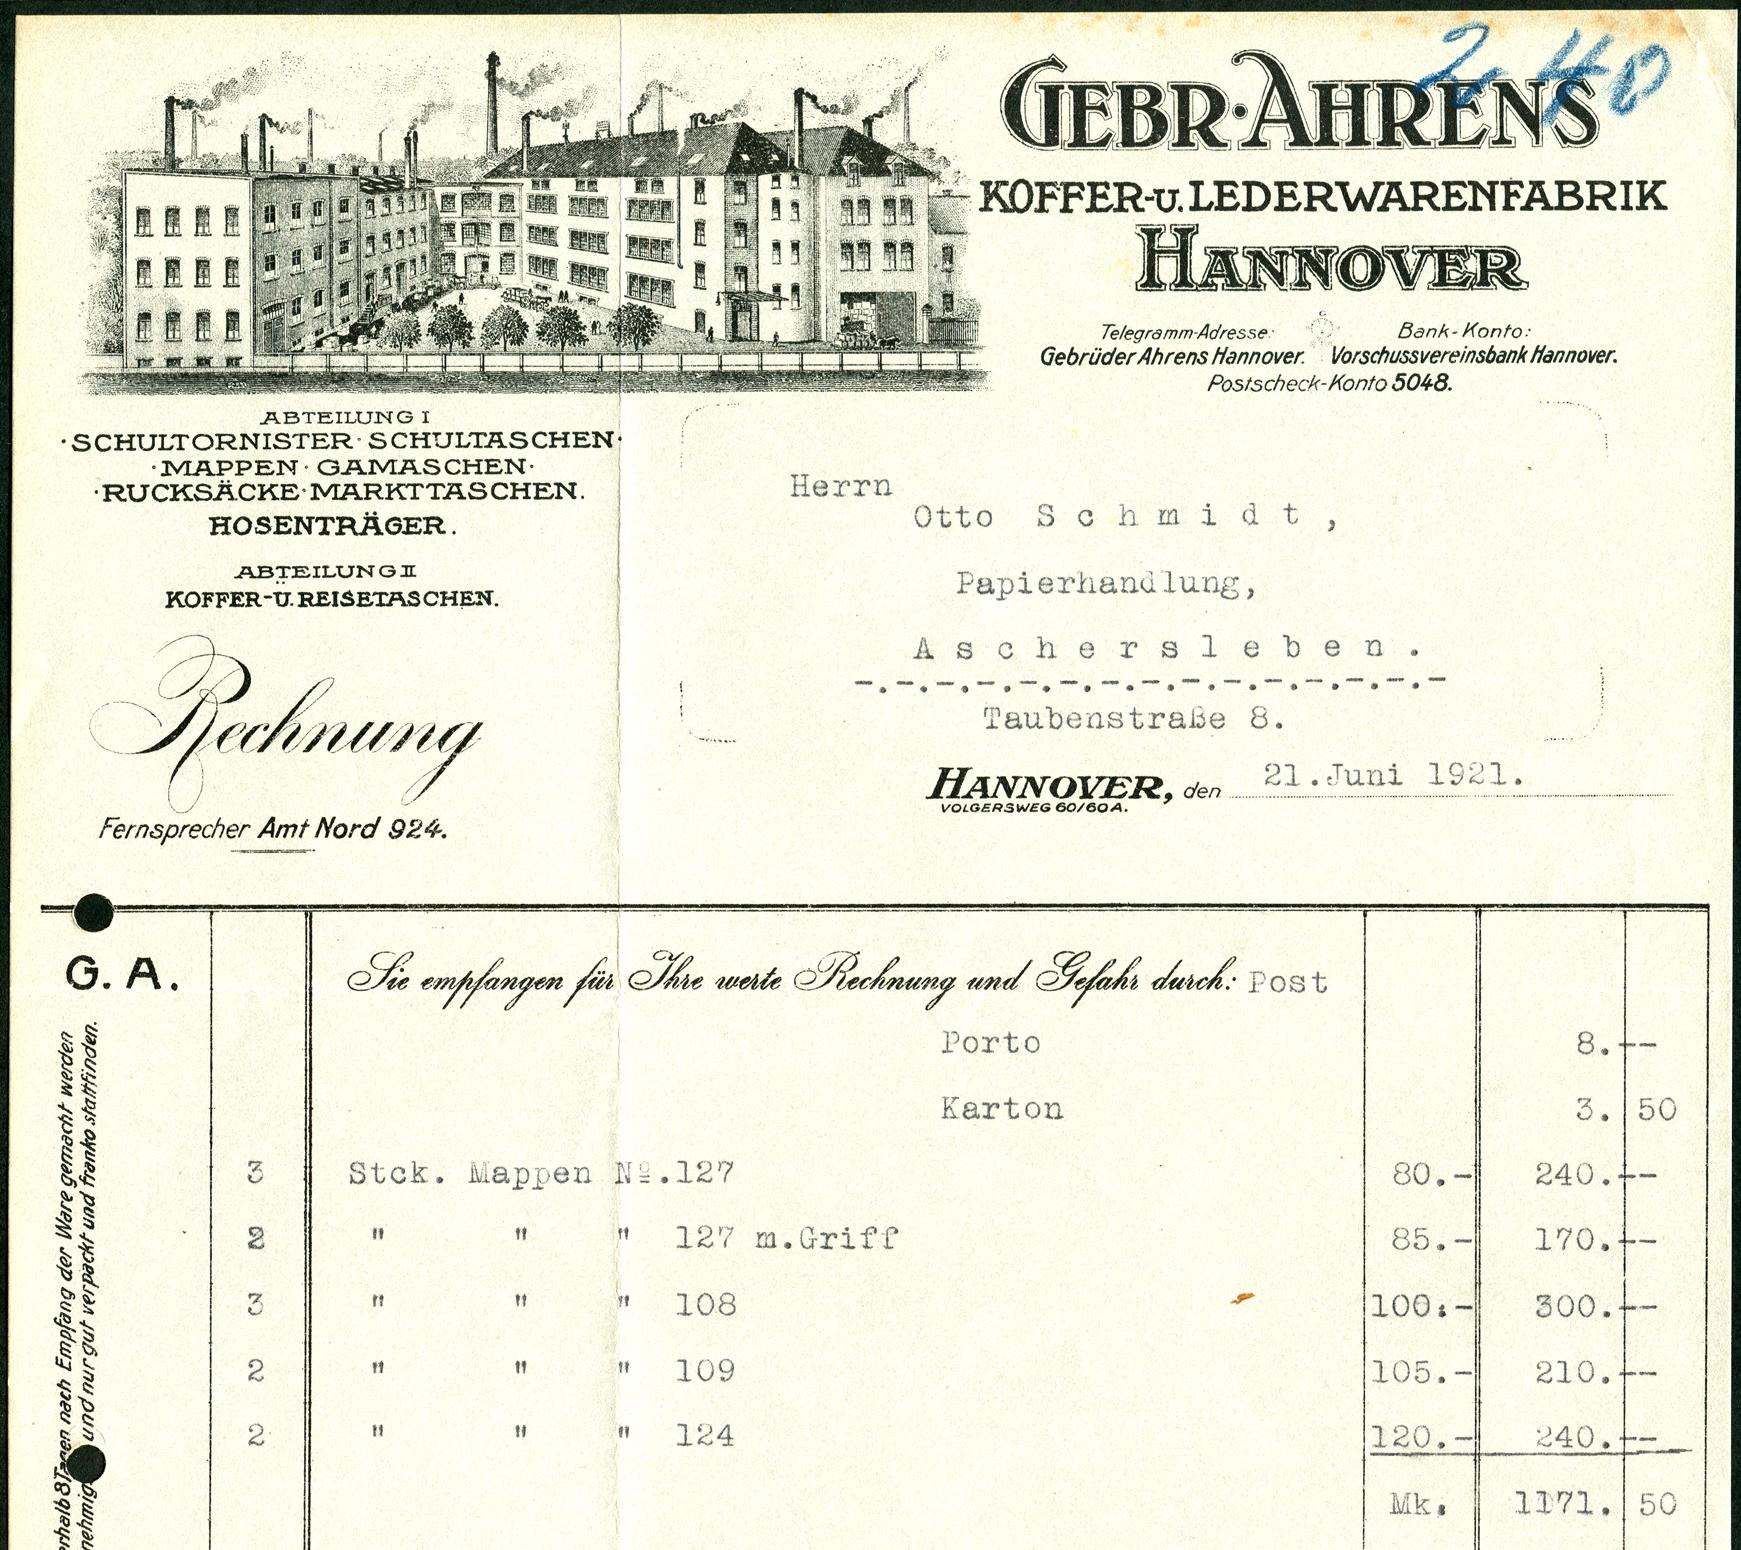 File:Gebr. Ahrens Koffer- und Lederwarenfabrik Hannover Volgersweg ...